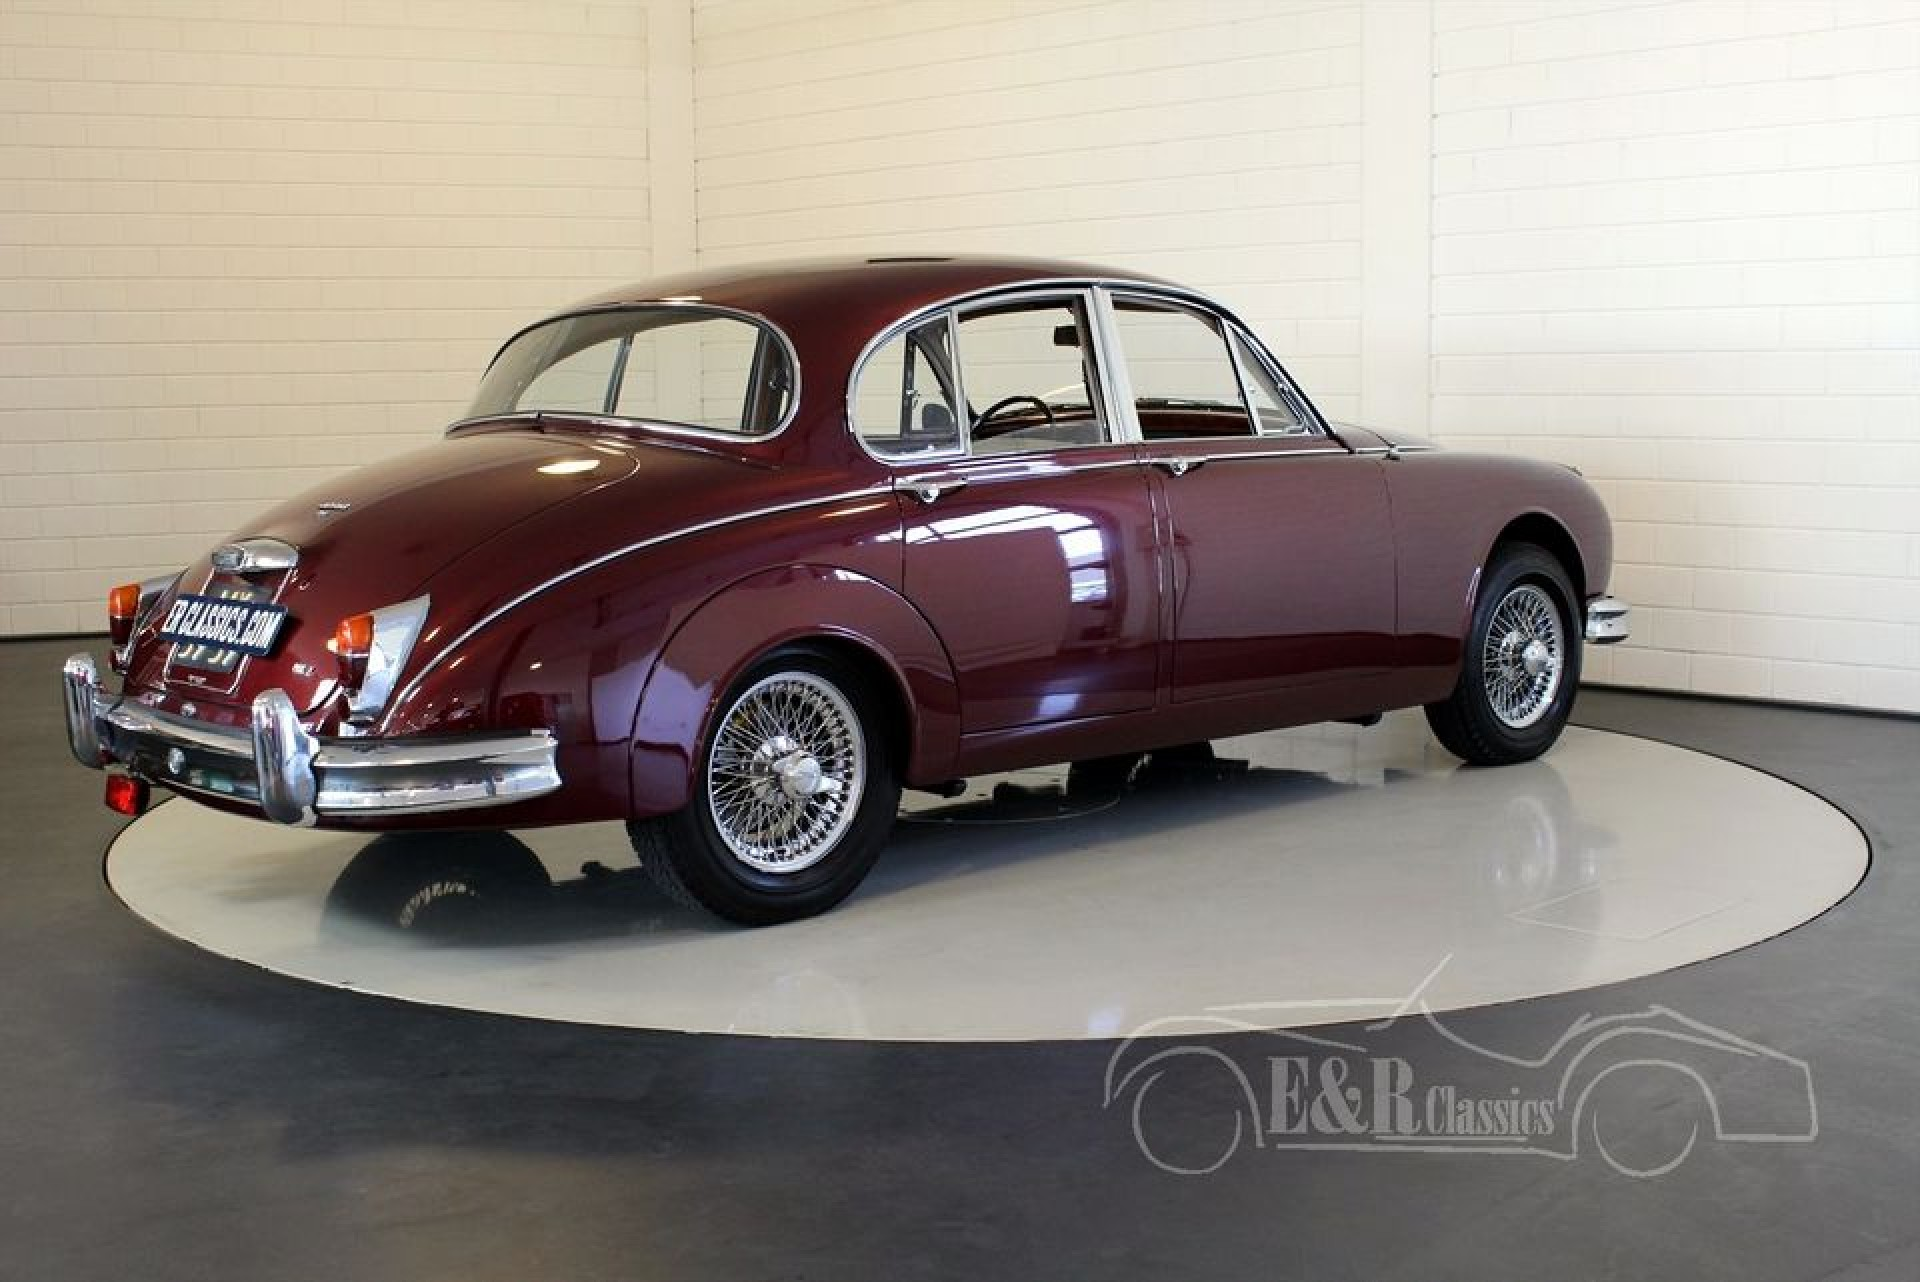 Jaguar Mk2 Saloon 1963 For Sale At Erclassics